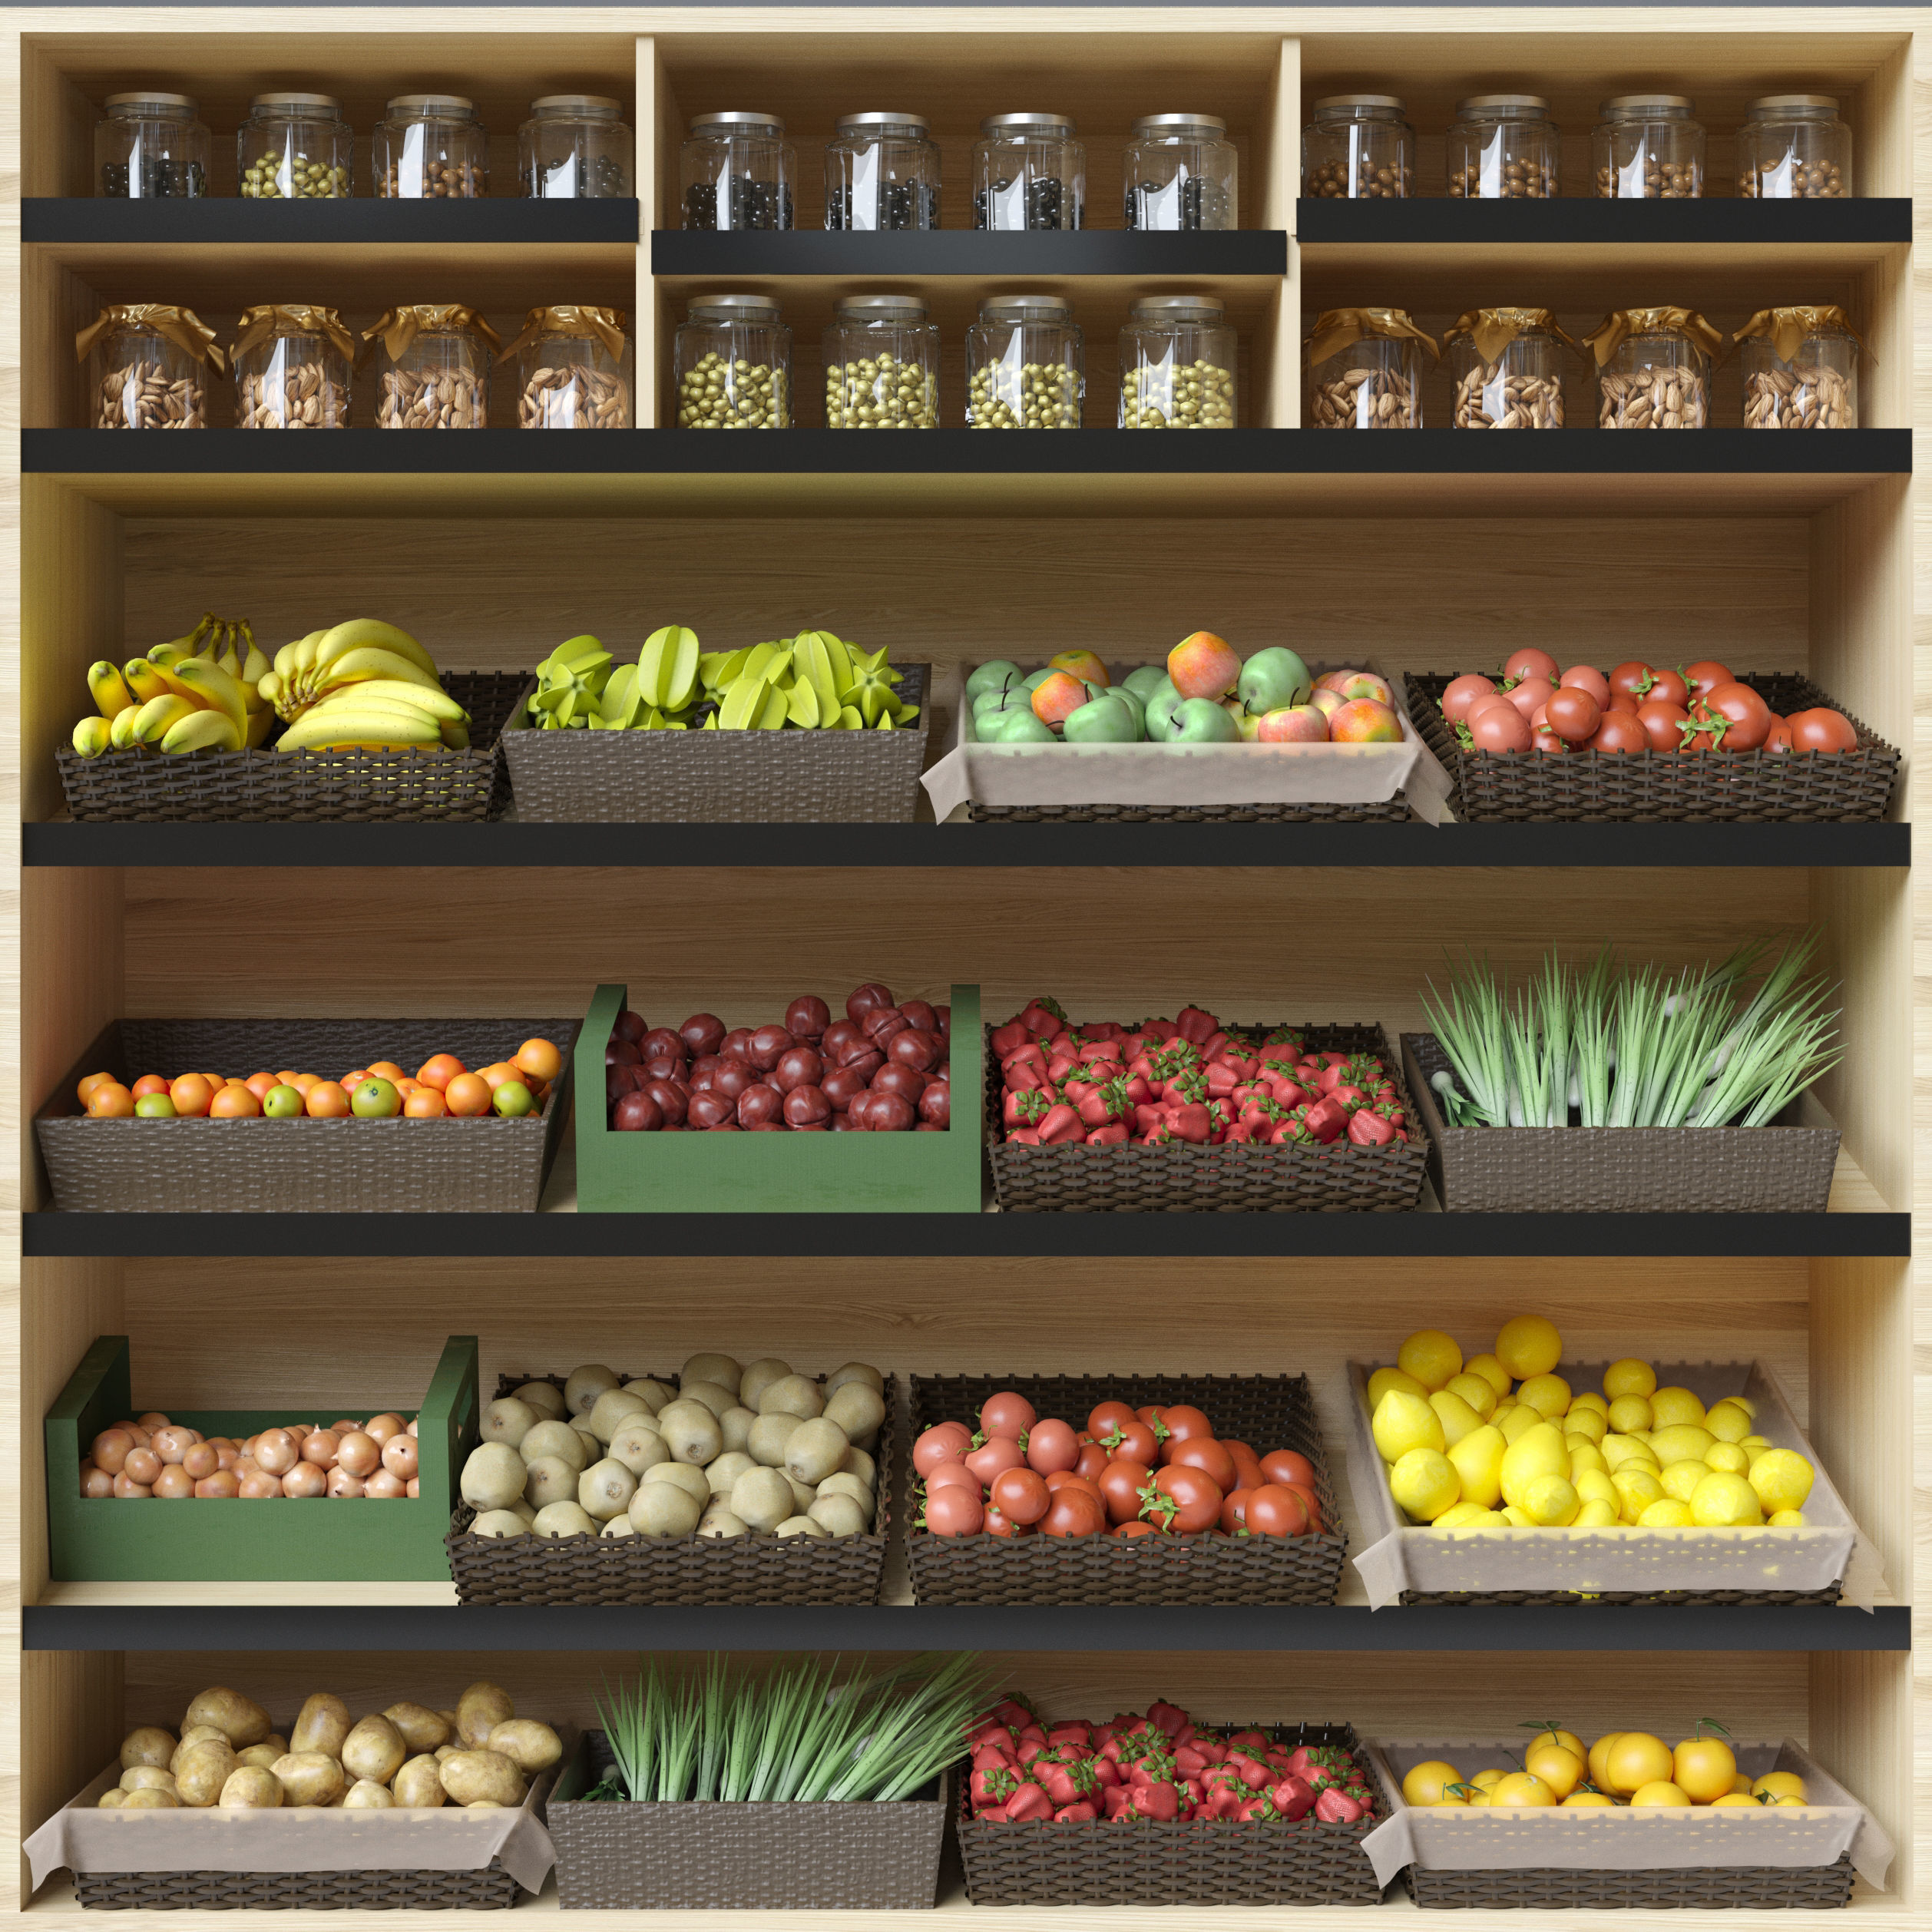 Fruit Shelf 2